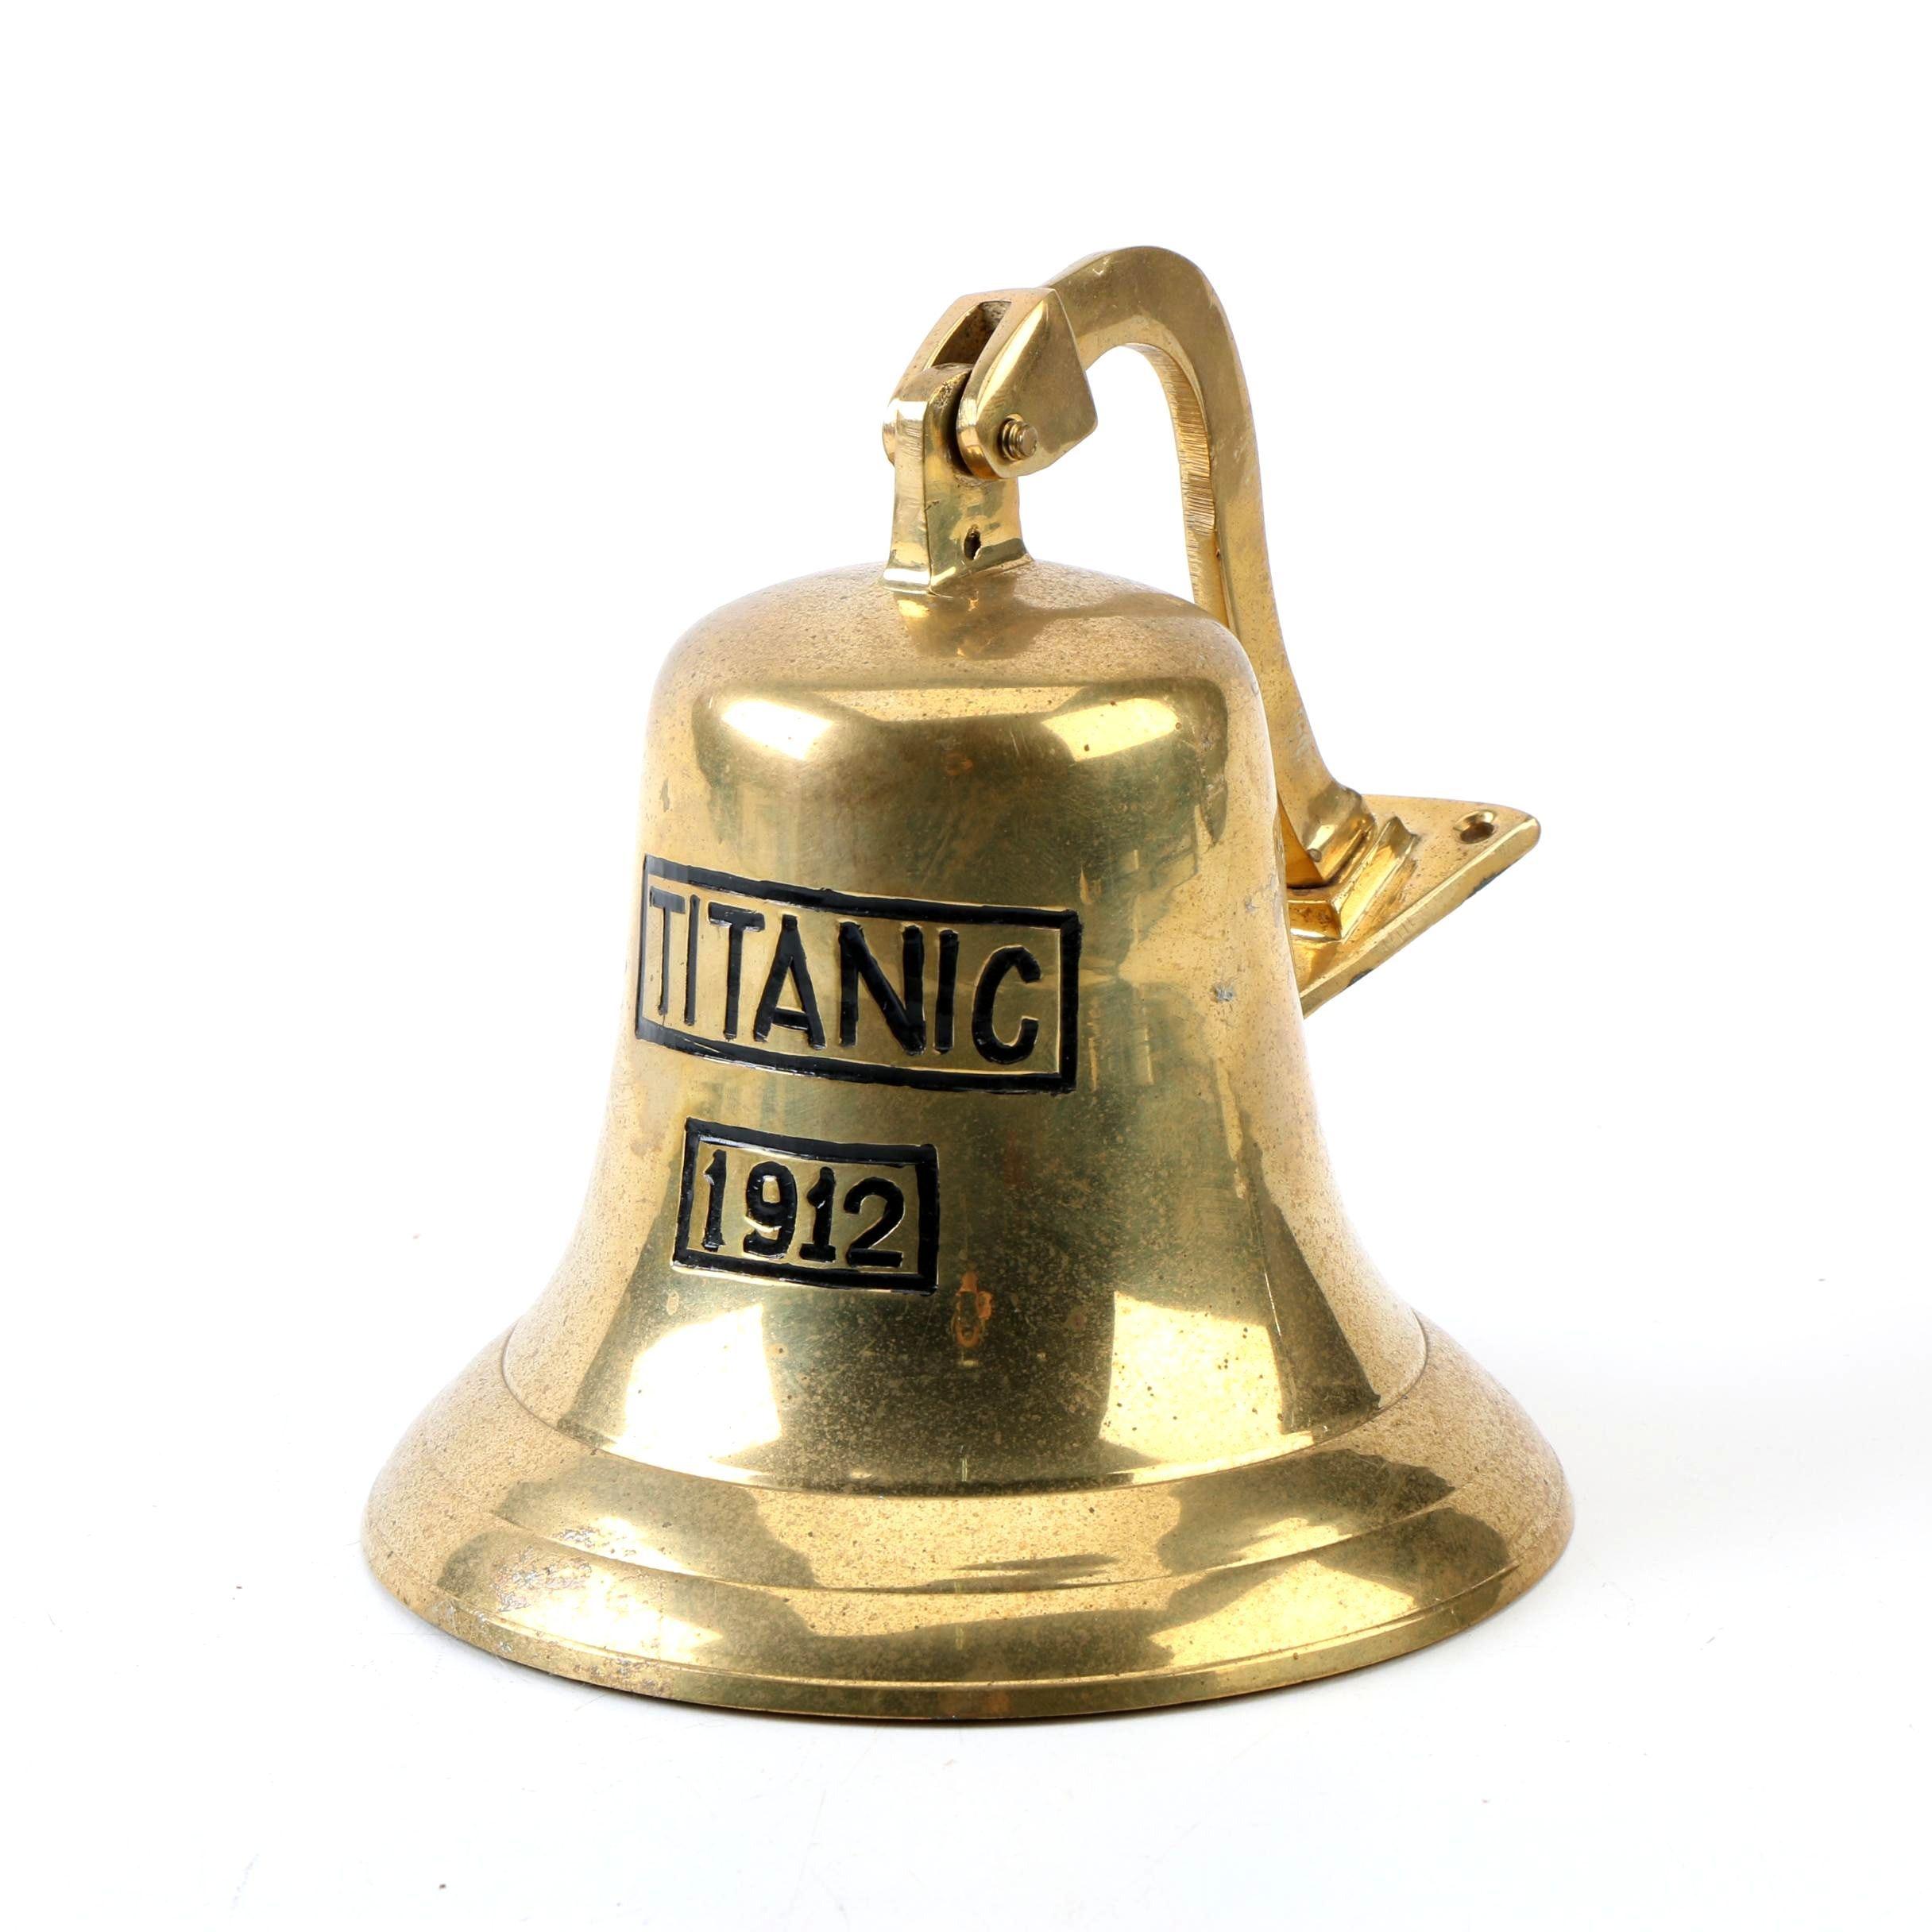 "Vintage Replica ""Titanic 1912"" Brass Bell"